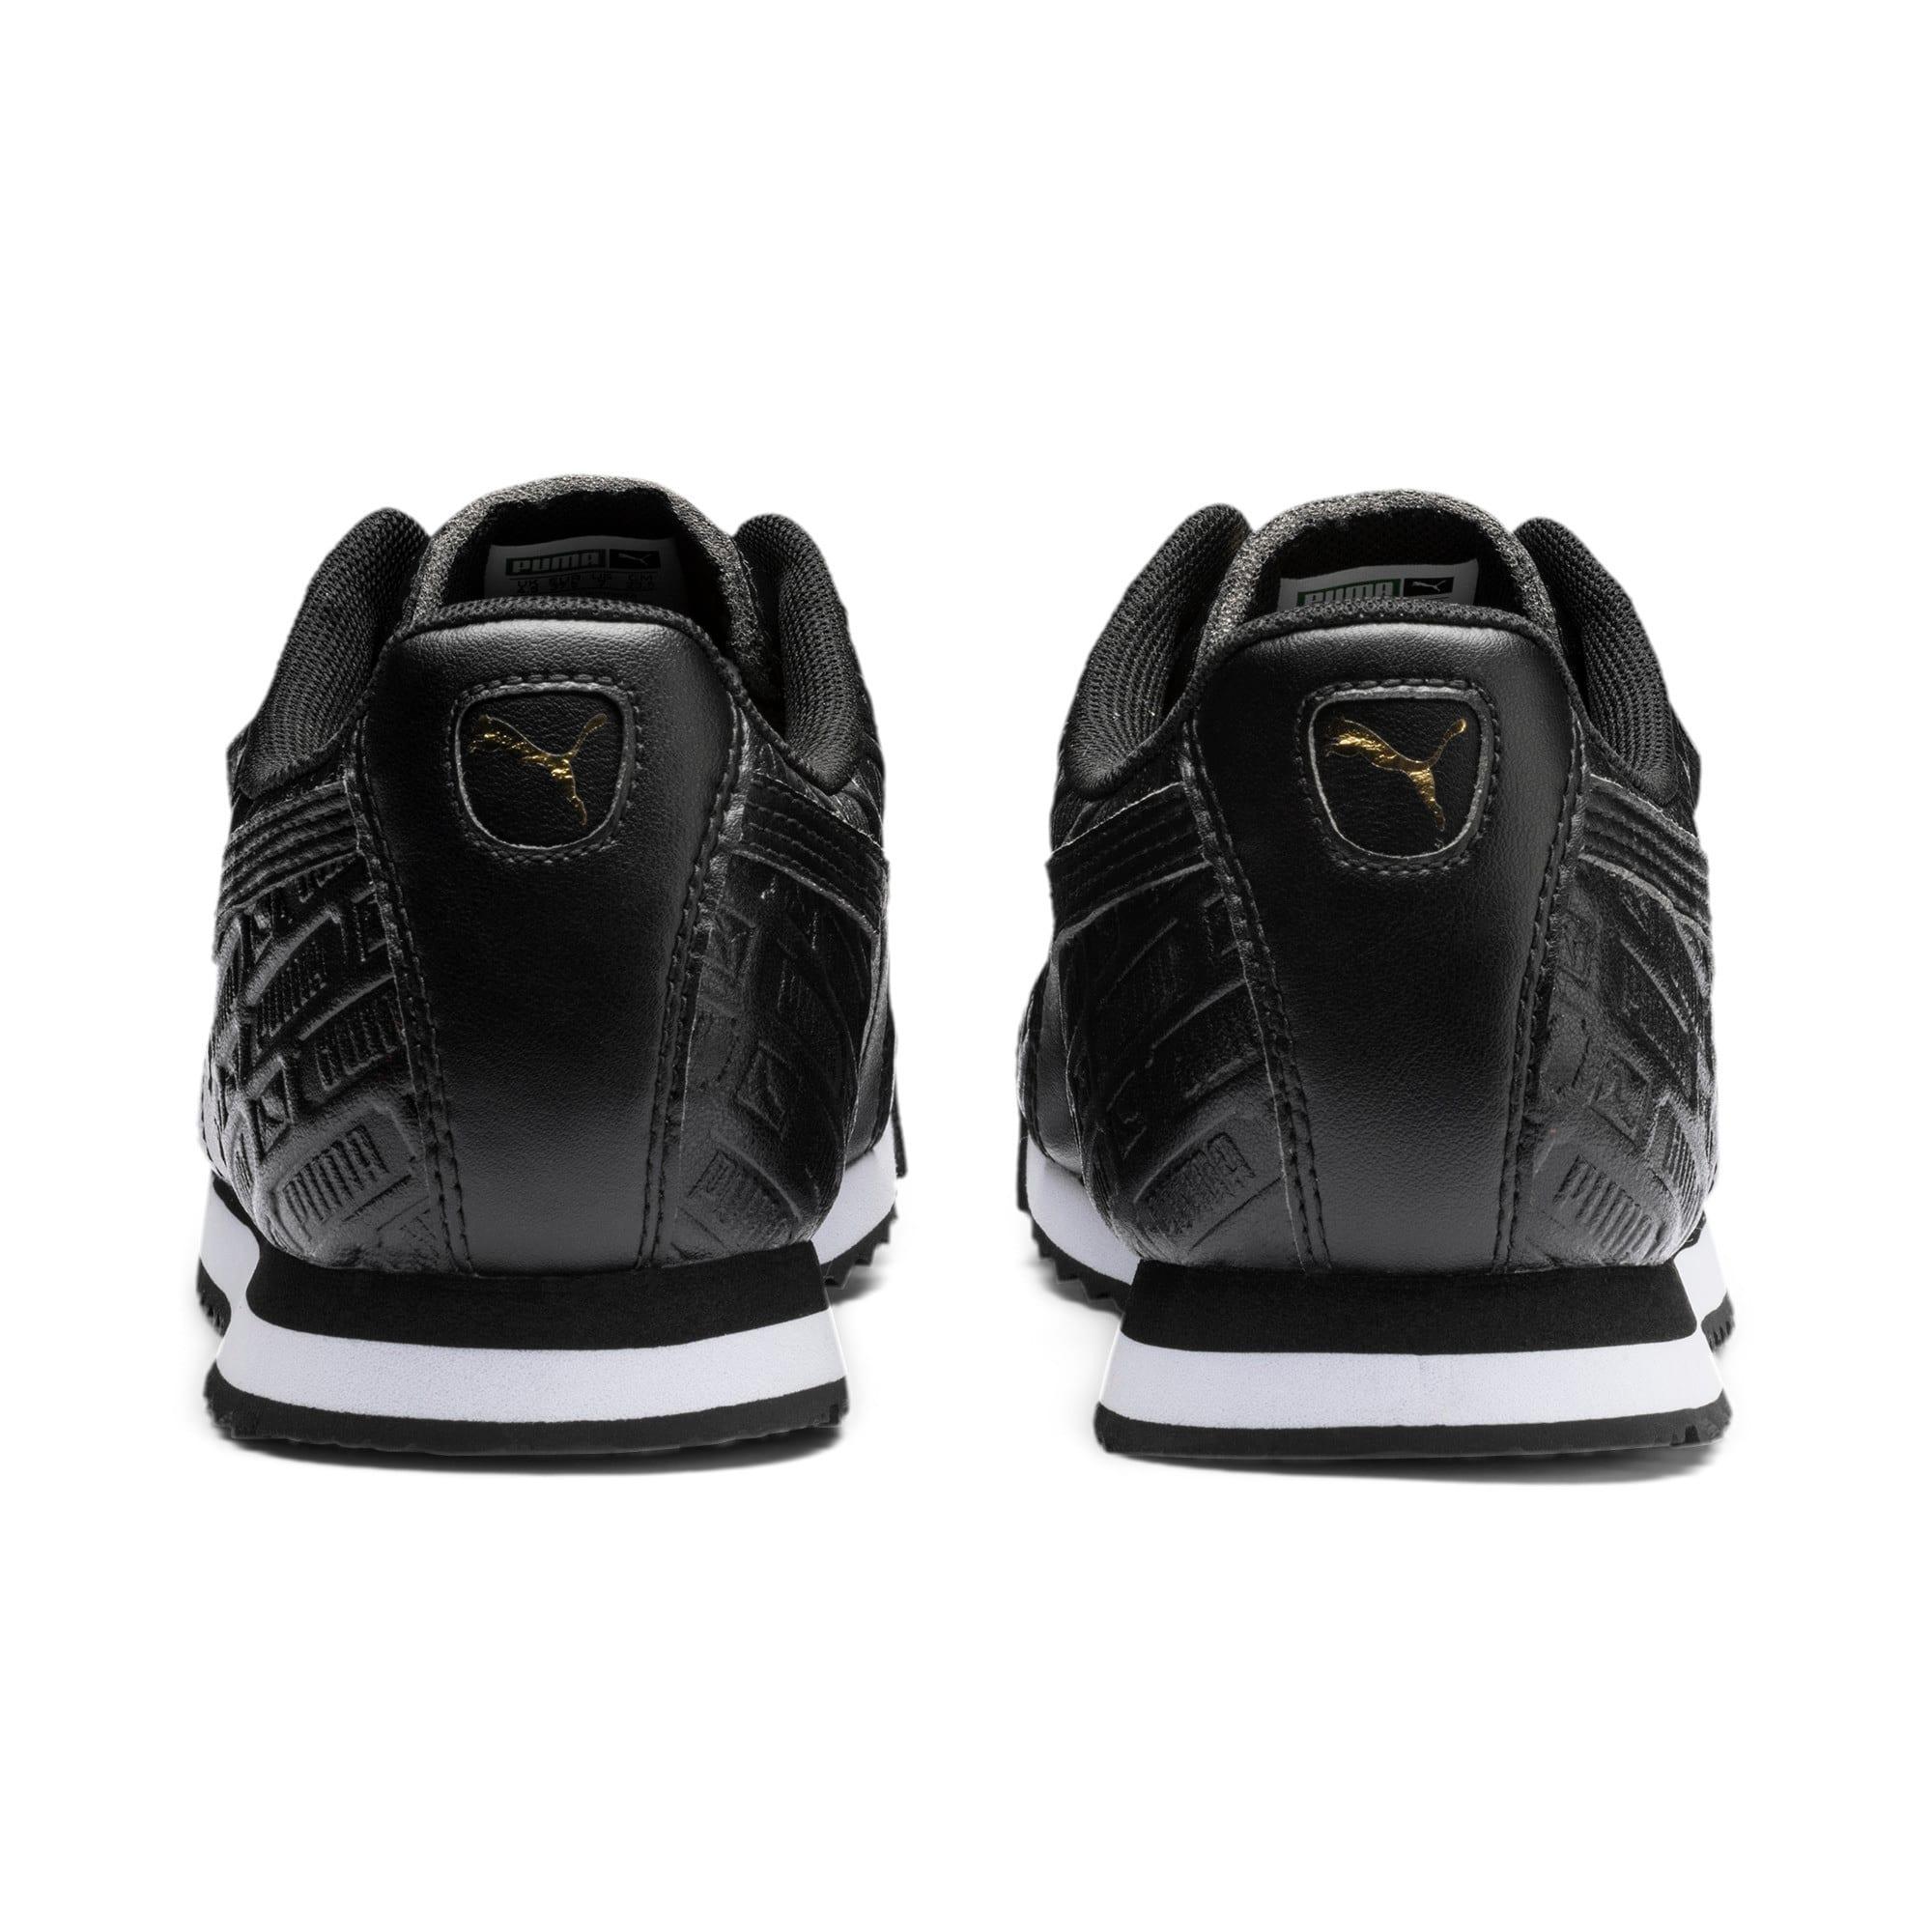 Thumbnail 4 of Roma Reinvent Women's Sneakers, Puma Black-Puma Team Gold, medium